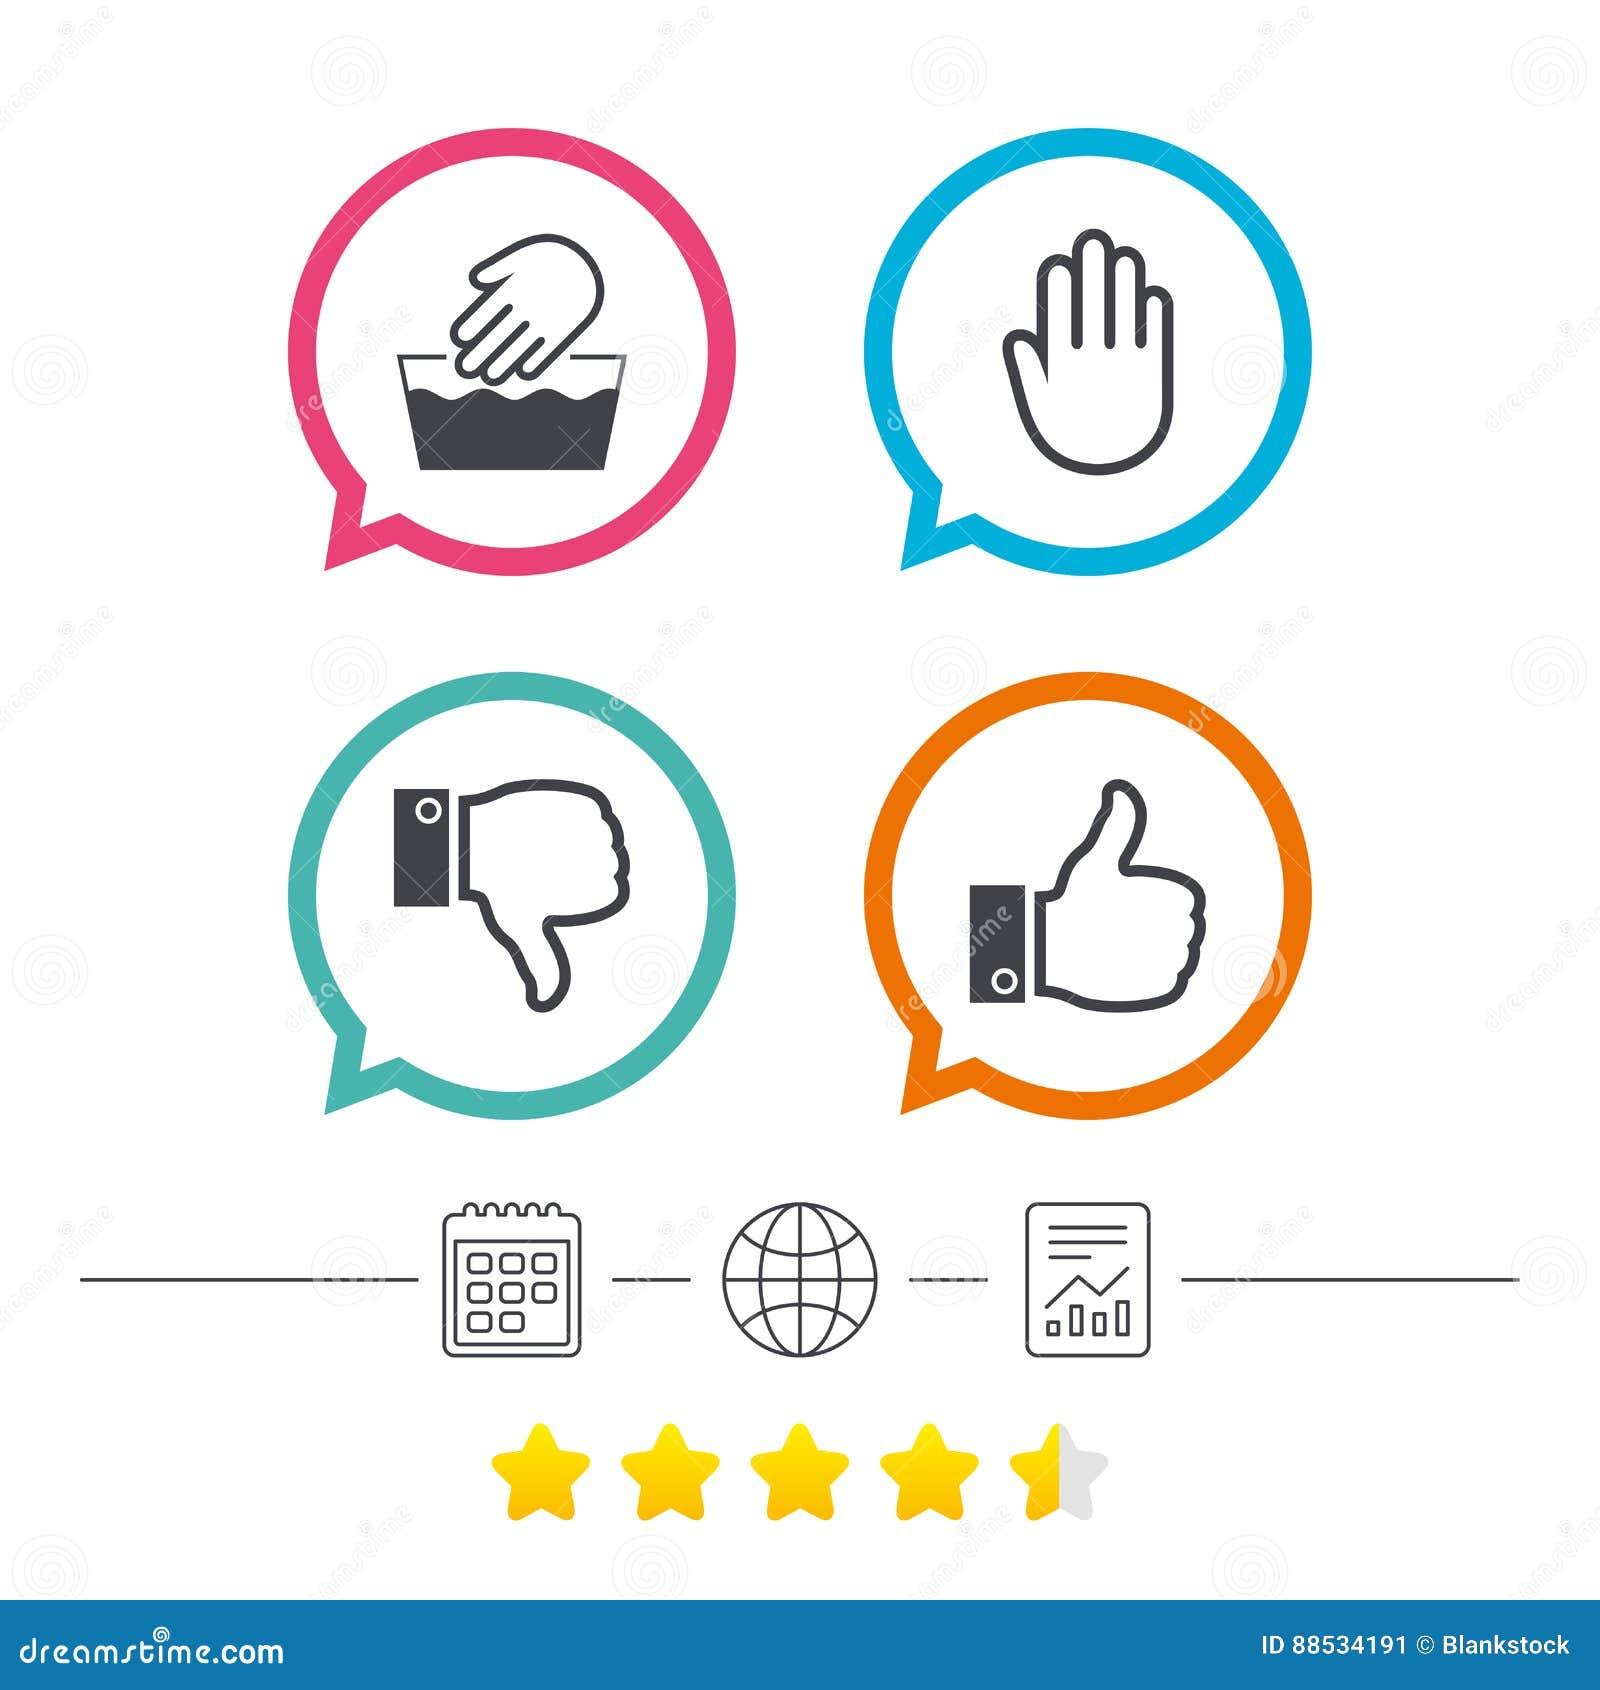 Hand icons like and dislike thumb up symbols stock vector hand icons like and dislike thumb up symbols buycottarizona